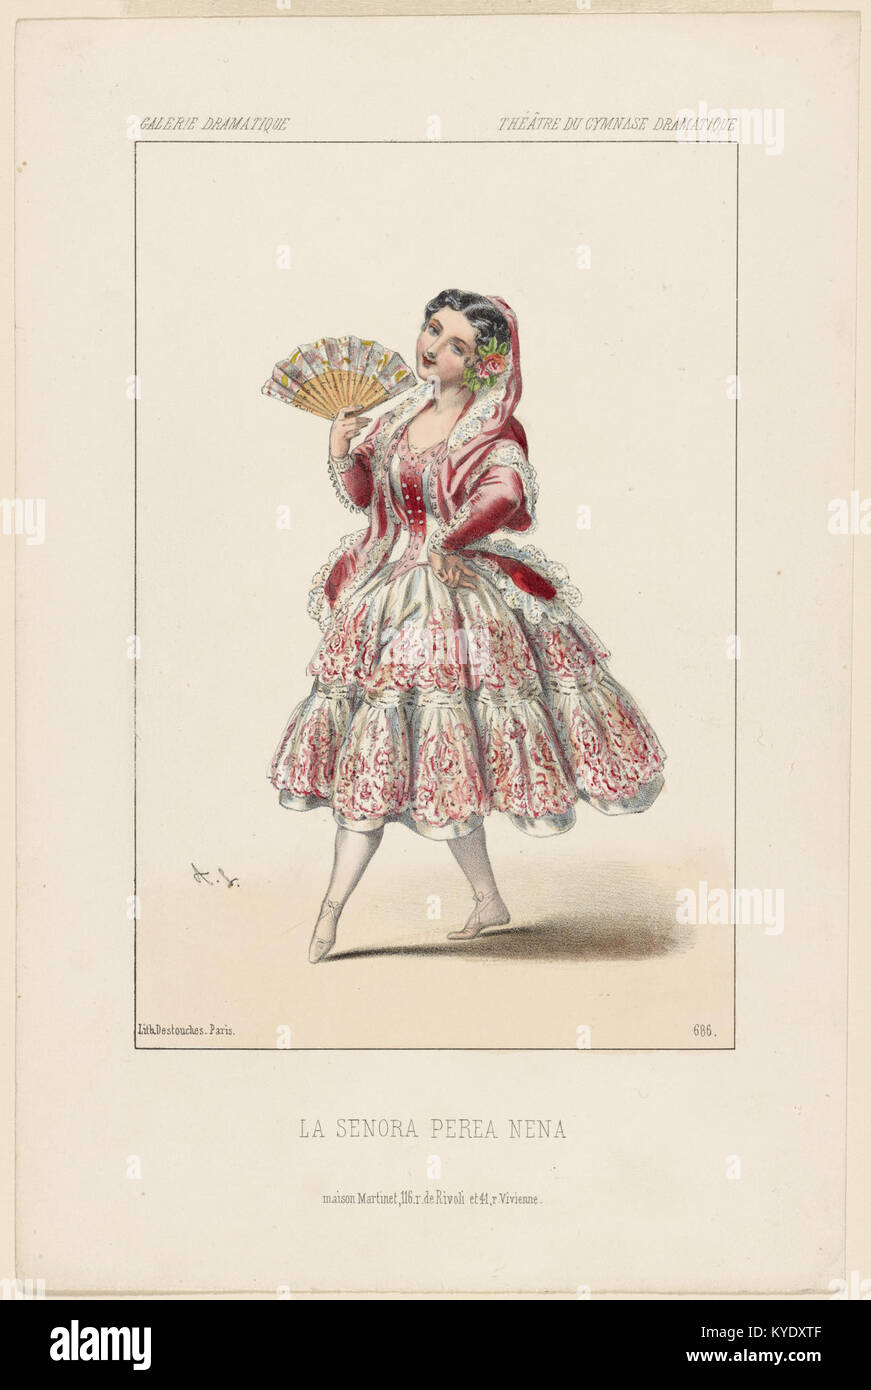 Théâtre du Cymnase (sic) Dramatique. La Senora Perea Nena (NYPL b12149003-5247031) - Stock Image